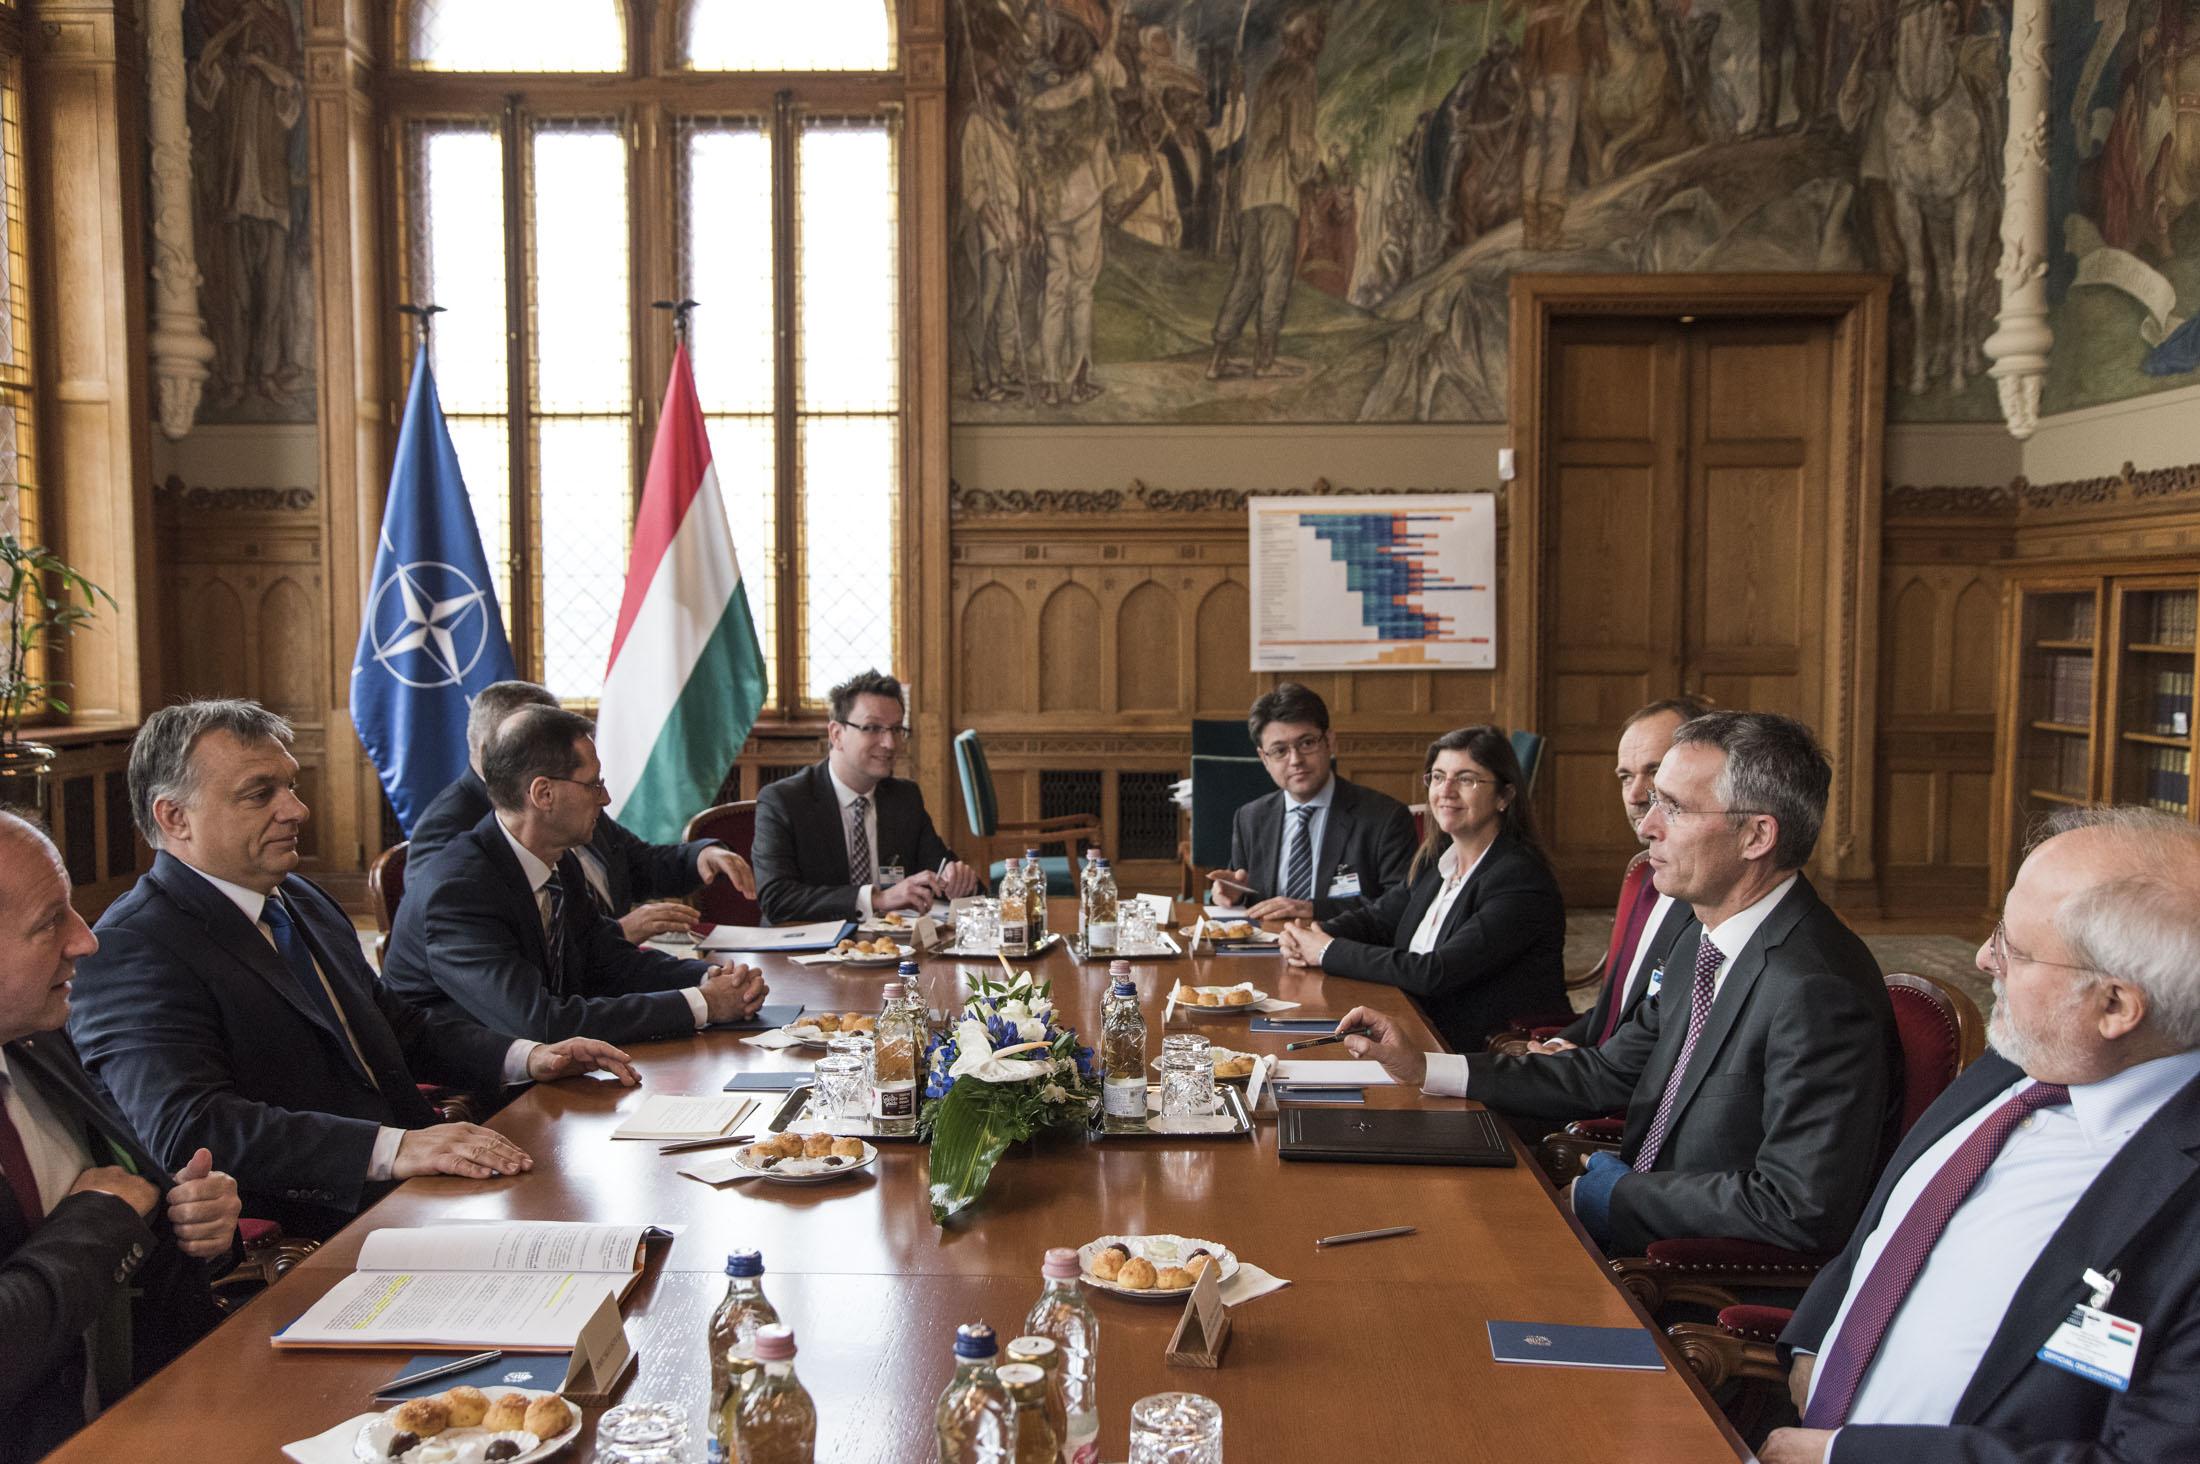 NATO Secretary General Jens Stoltenberg meets with the Prime Minister of Hungary, Viktor Orban